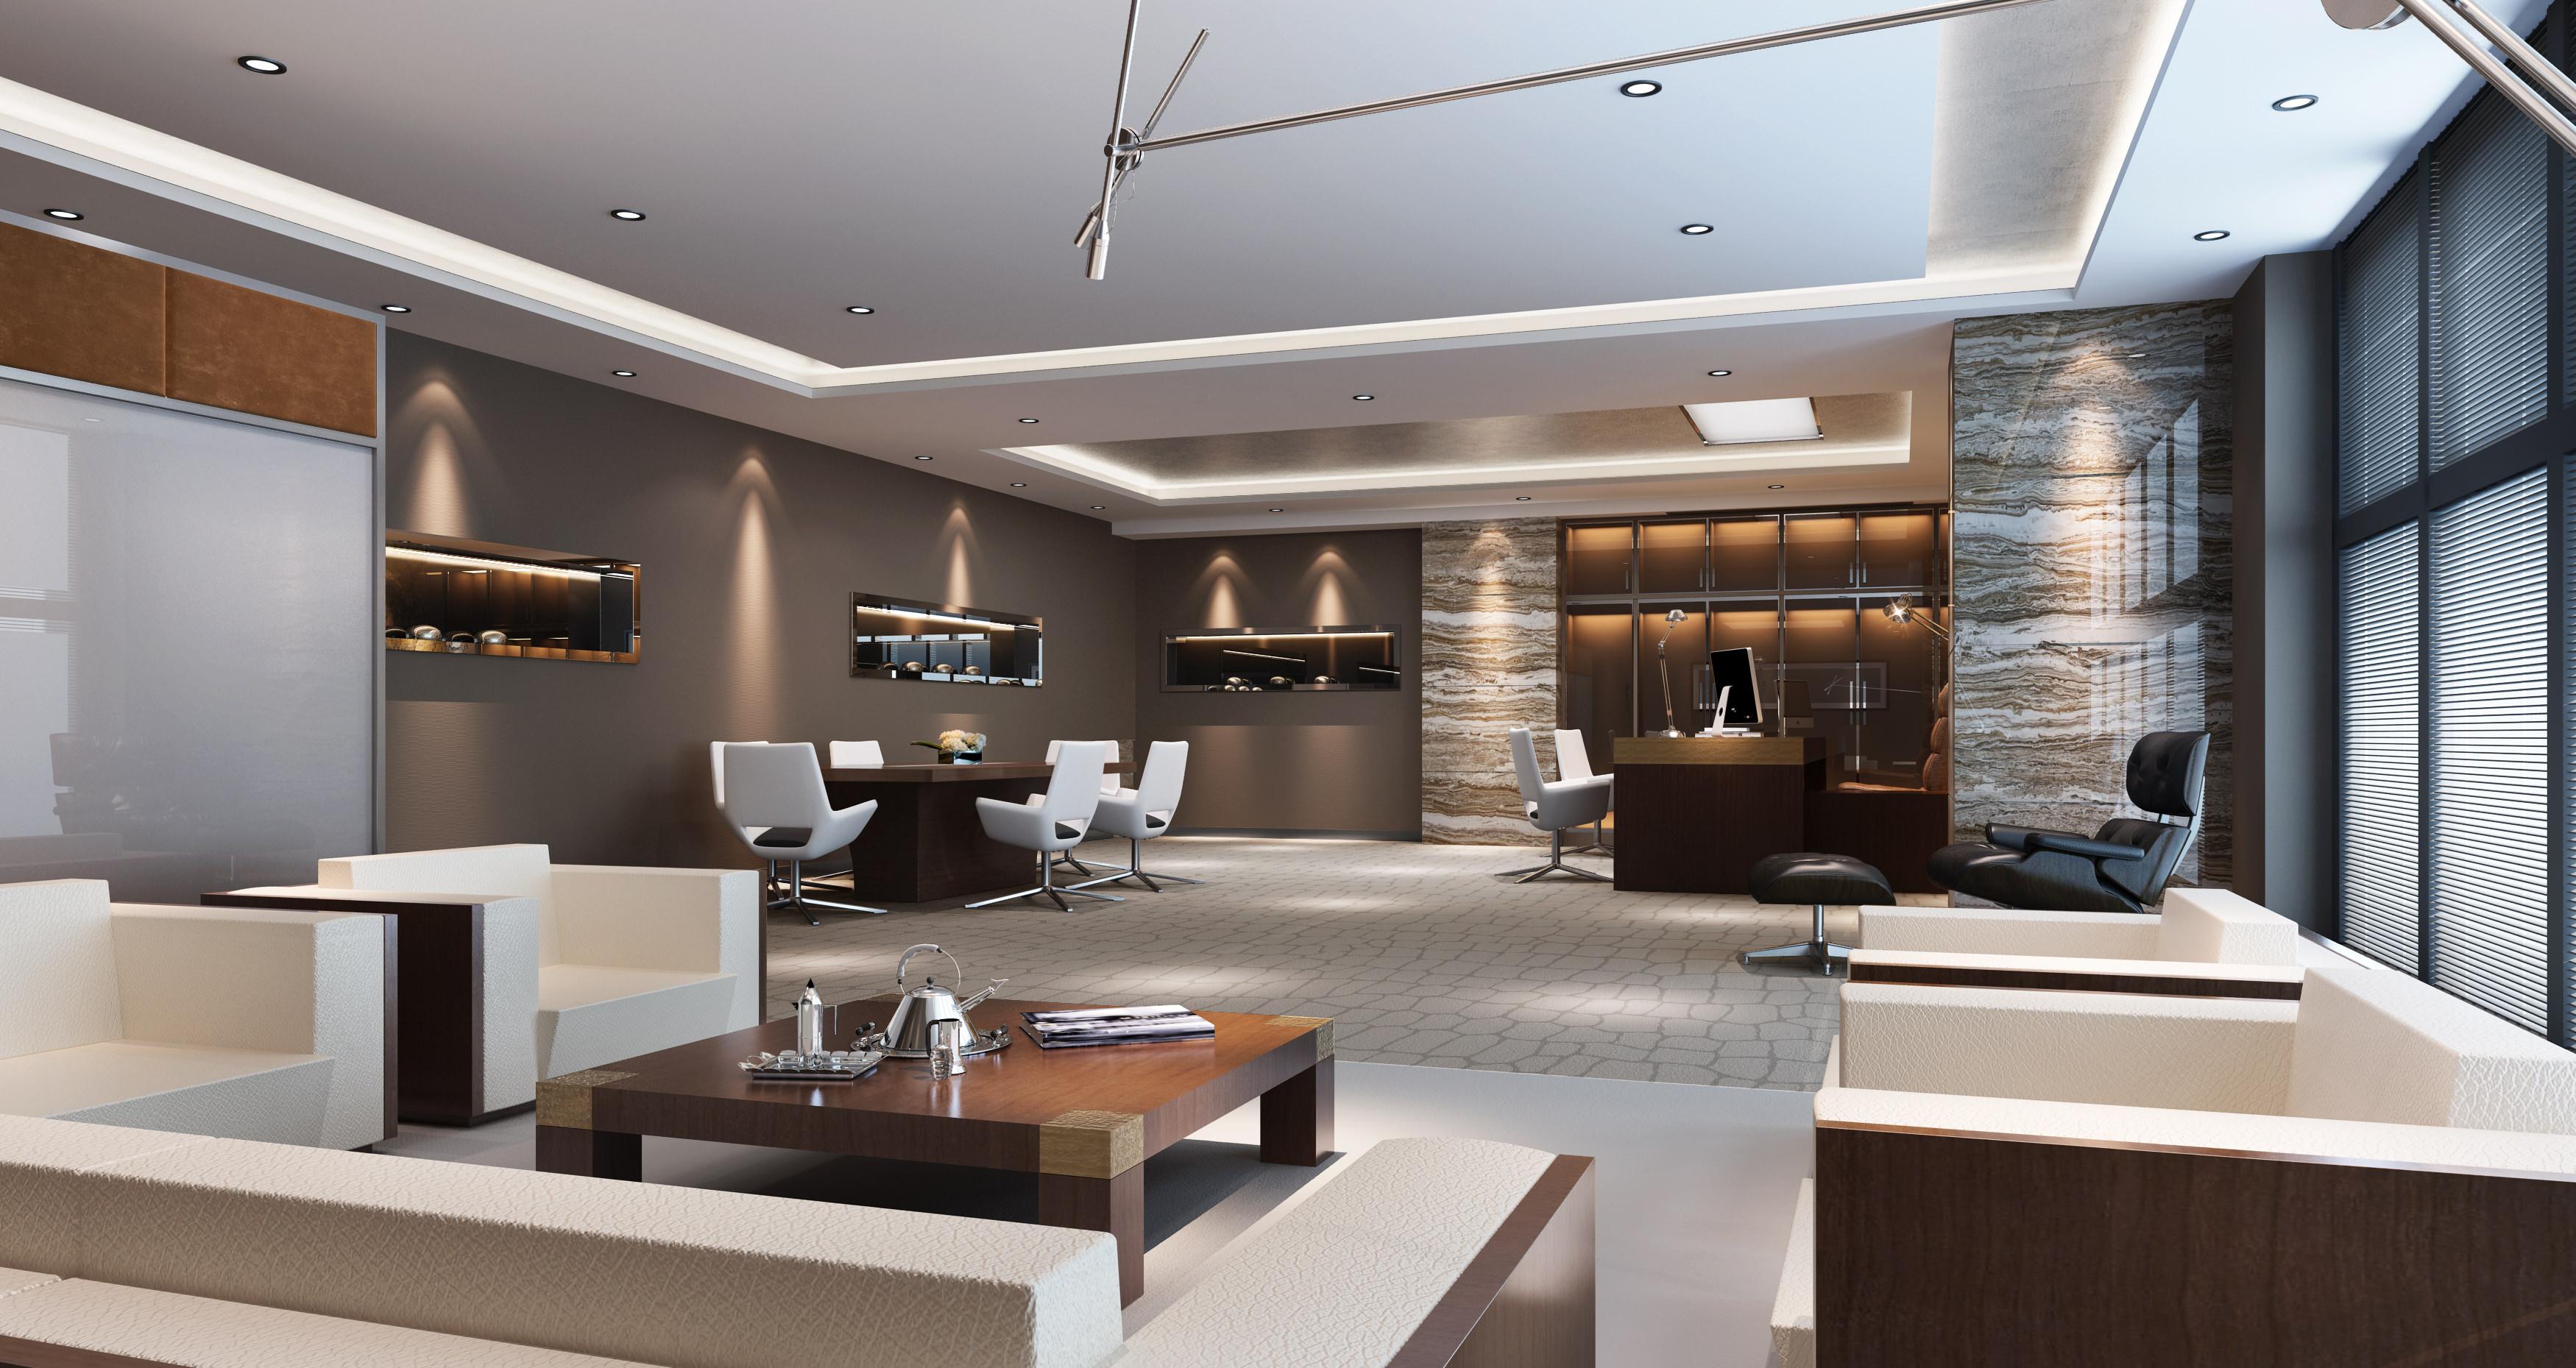 office room. Modern Office Room 3d Model Max 1 3